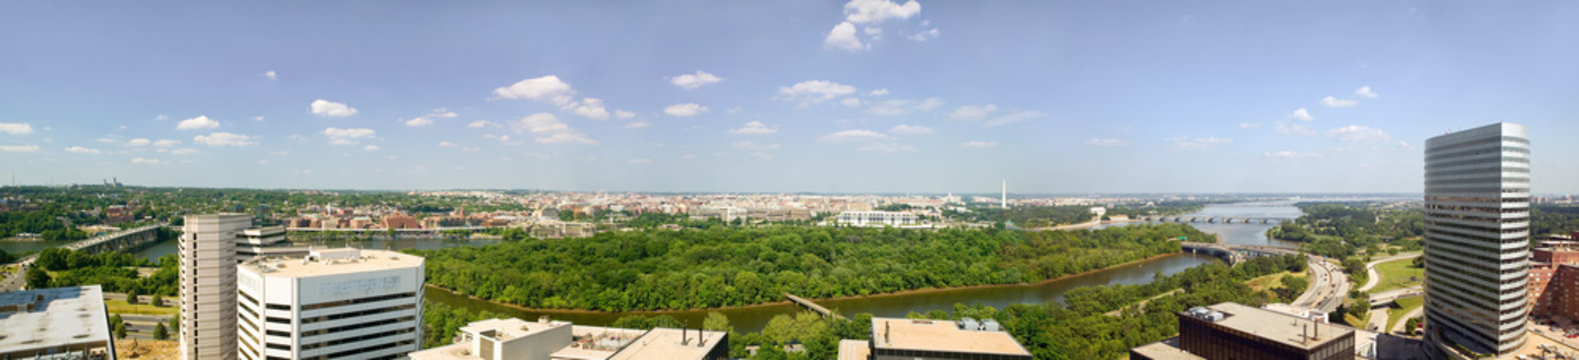 Panoramic aerial view of Washington D.C.